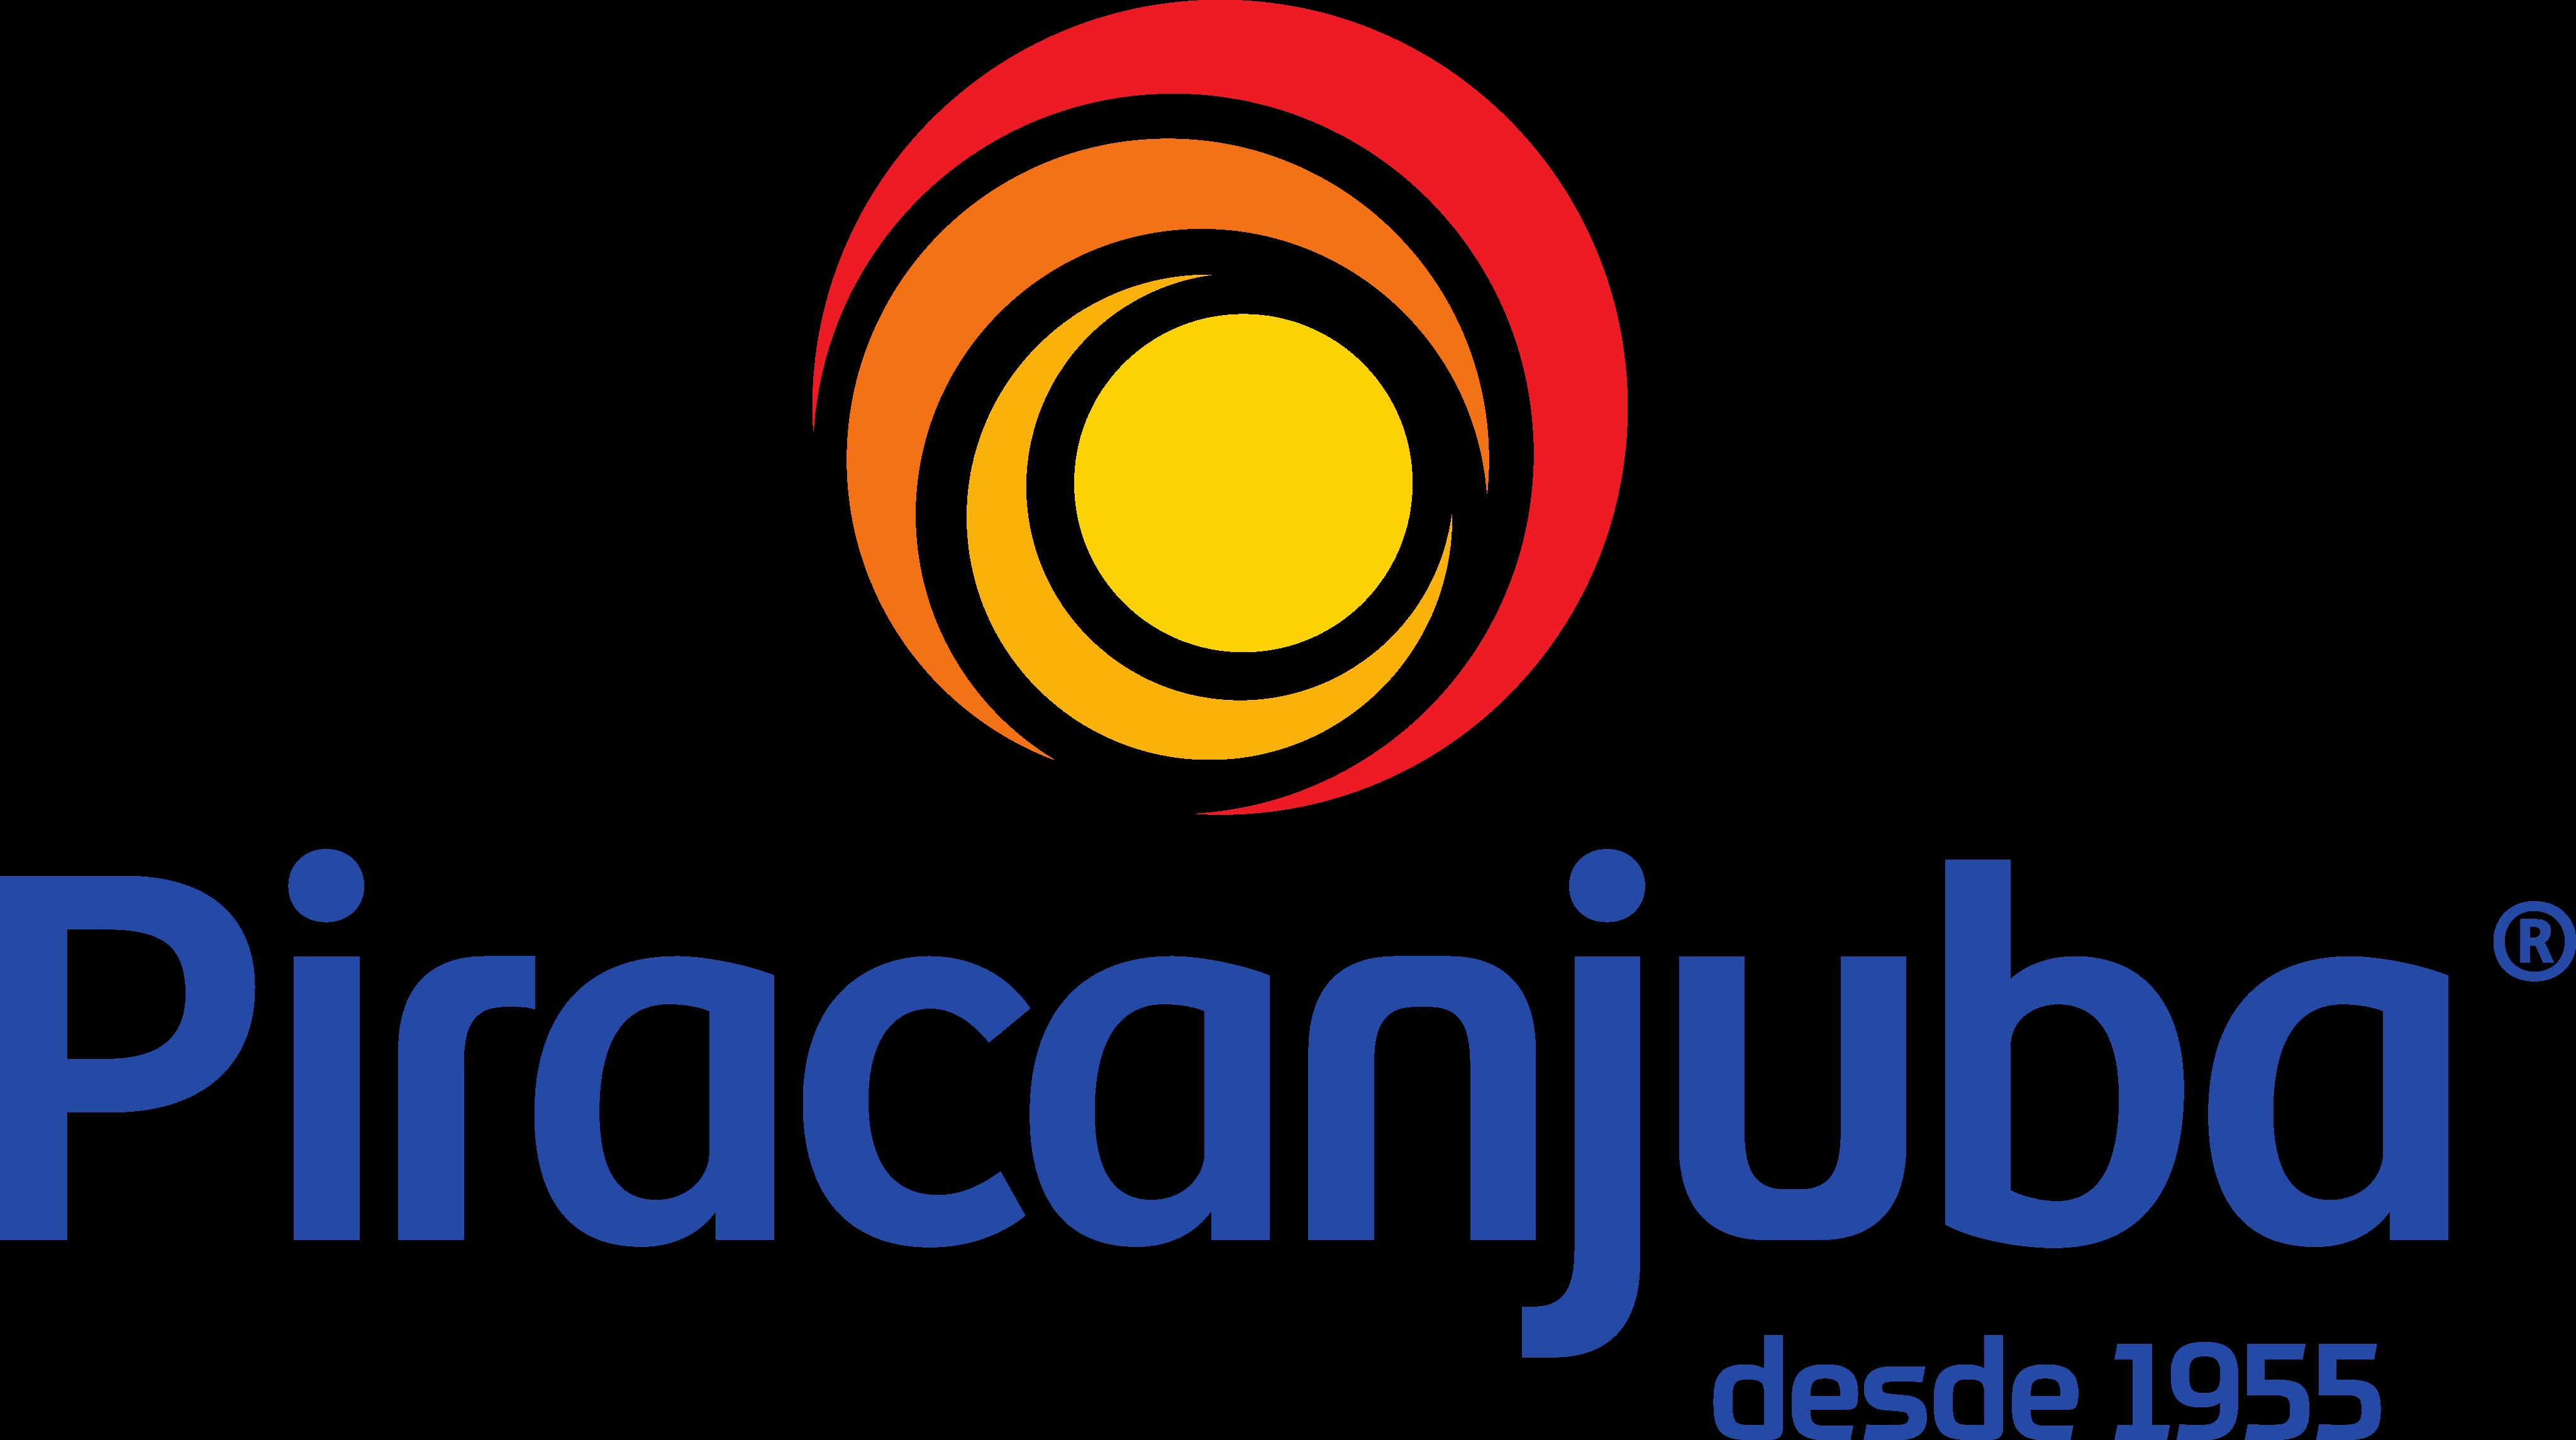 Piracanjuba Logo.